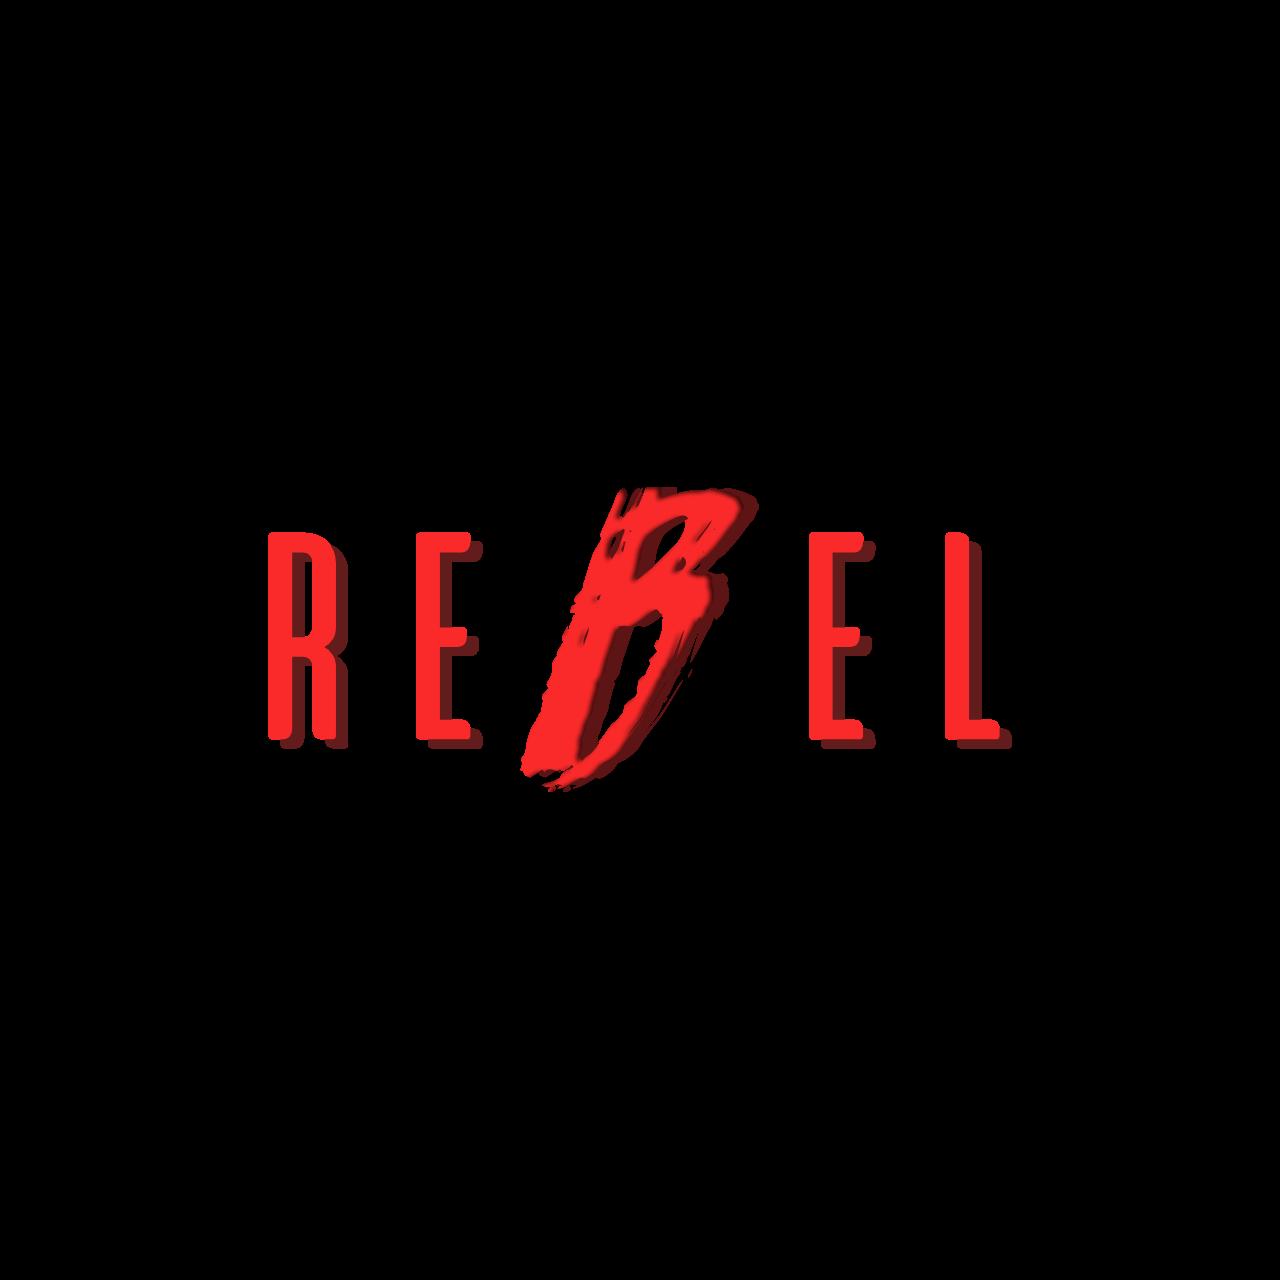 Rebel Thought Leadership Marketing